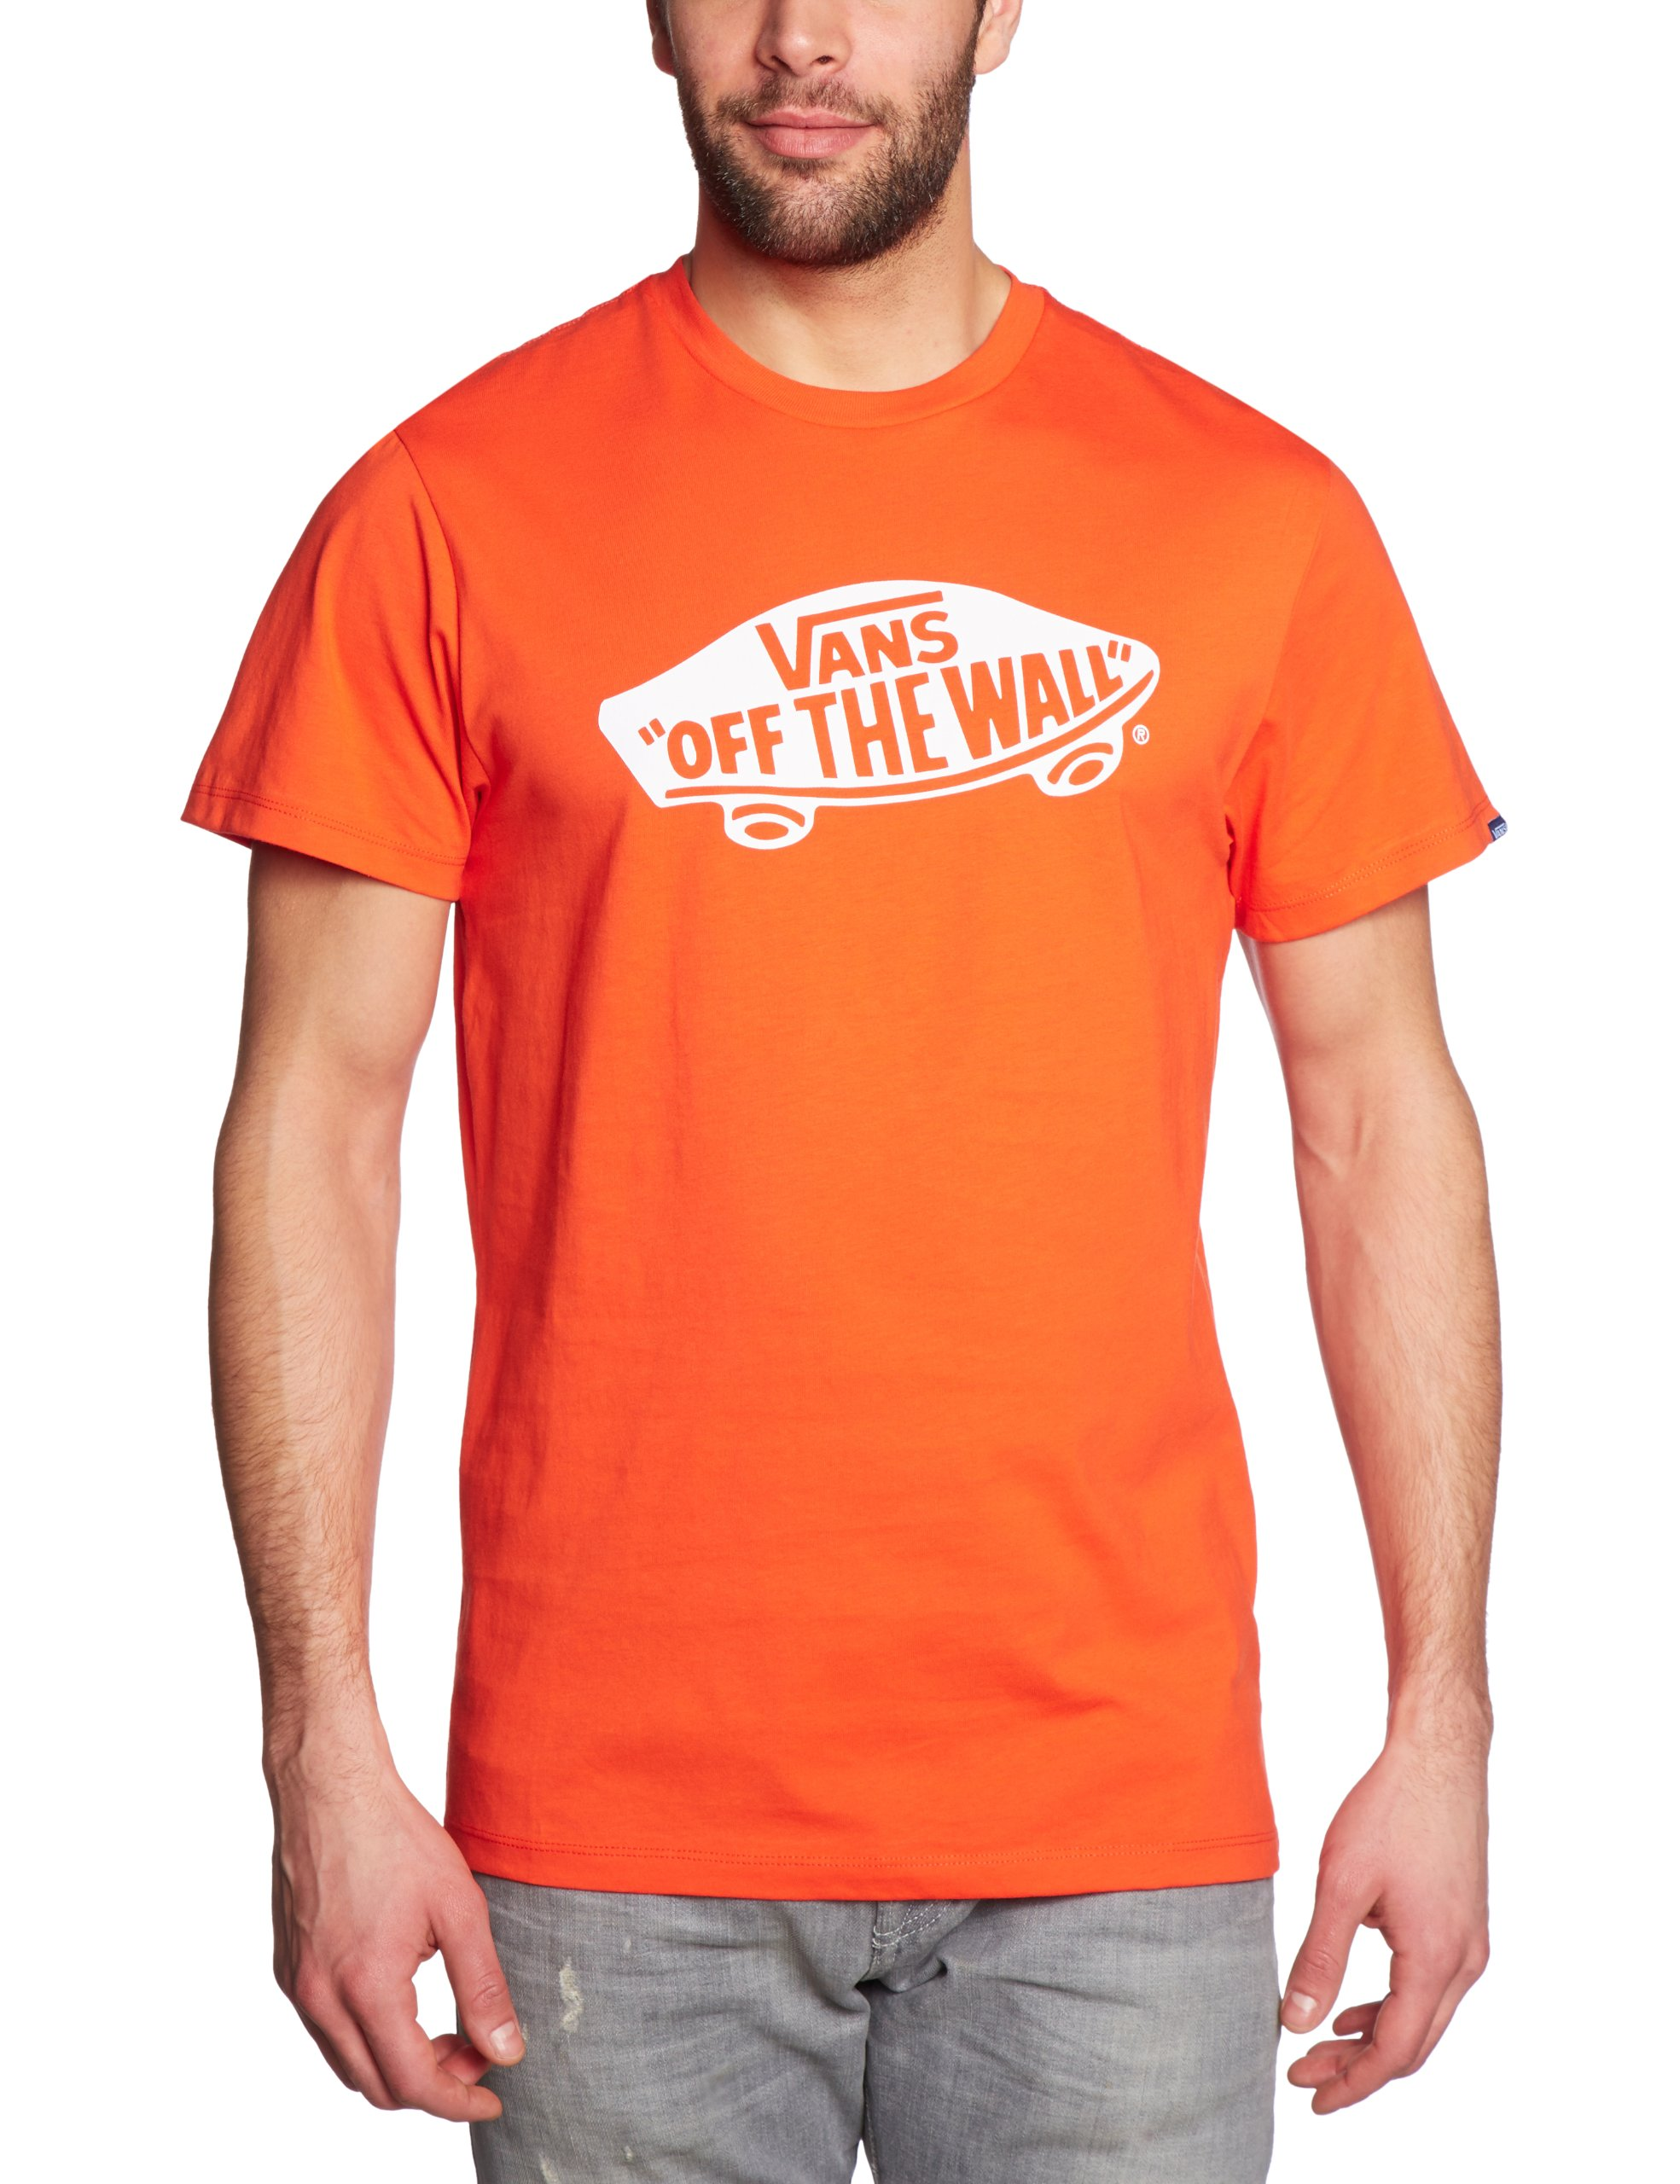 Vans OTW, T-shirt Uomo 1 spesavip